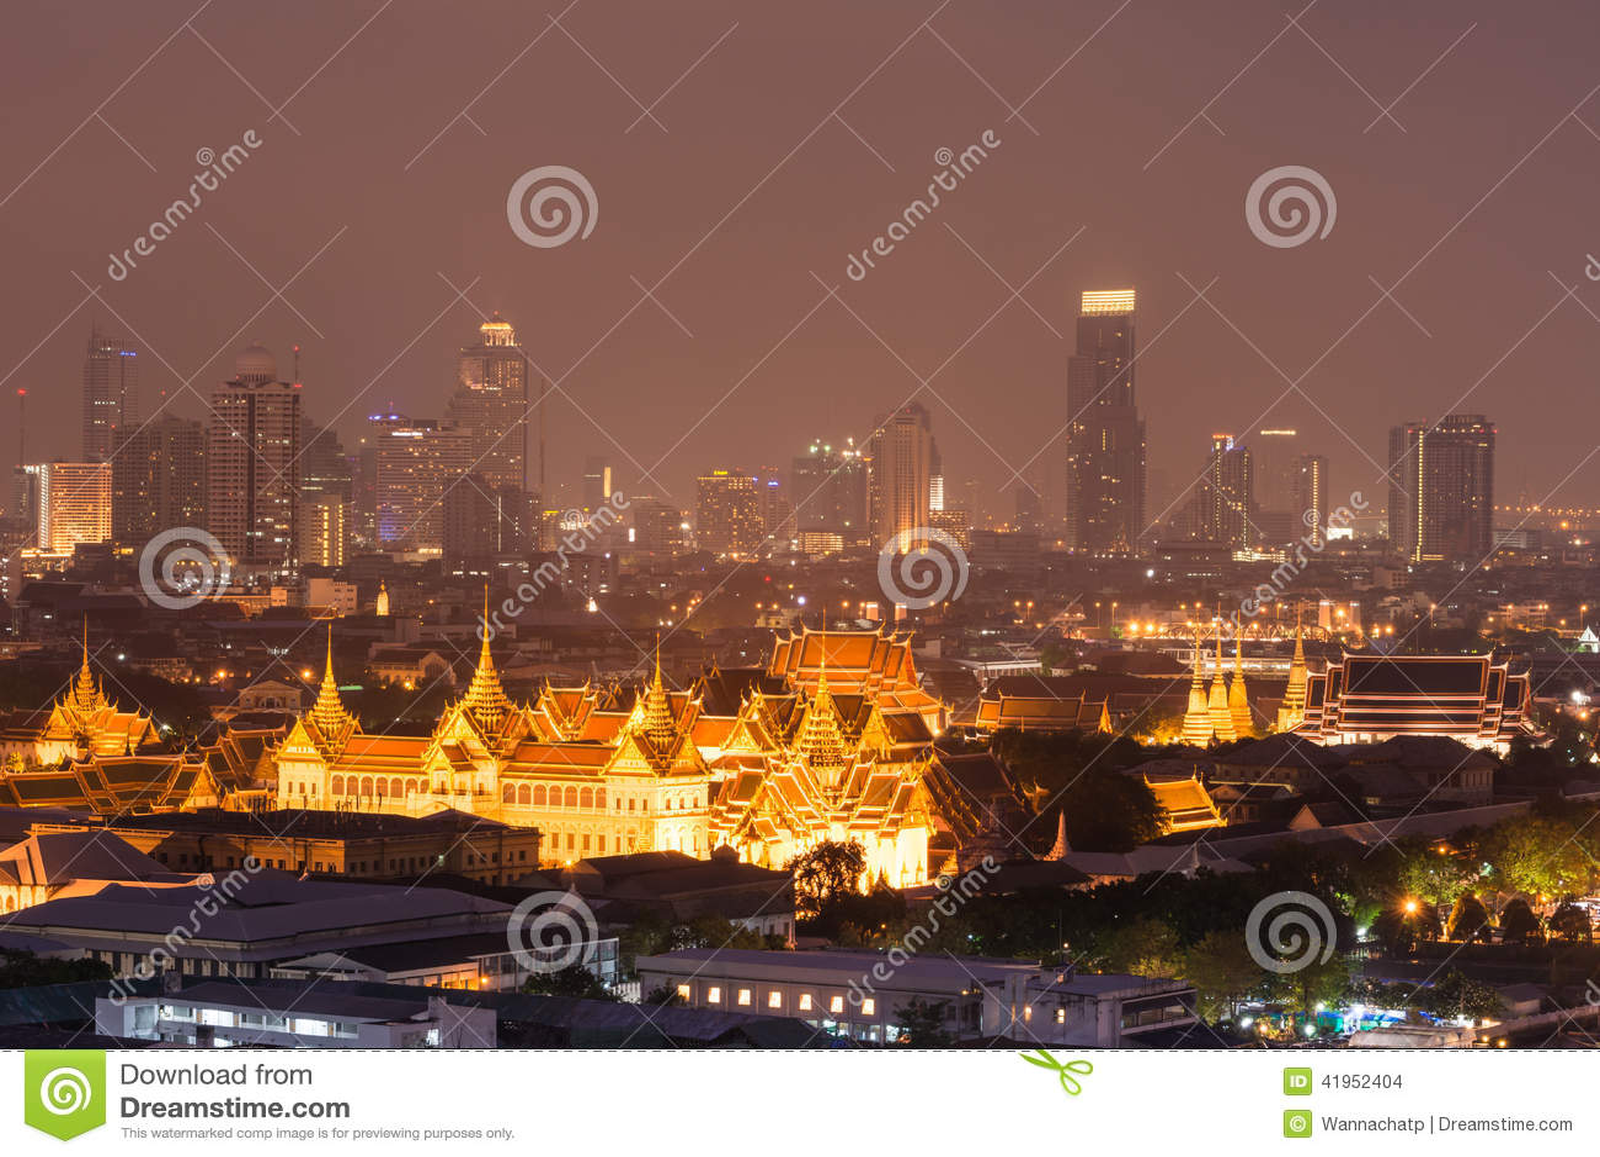 Grand Palace, Emerald Buddha Temple And Night City View ...